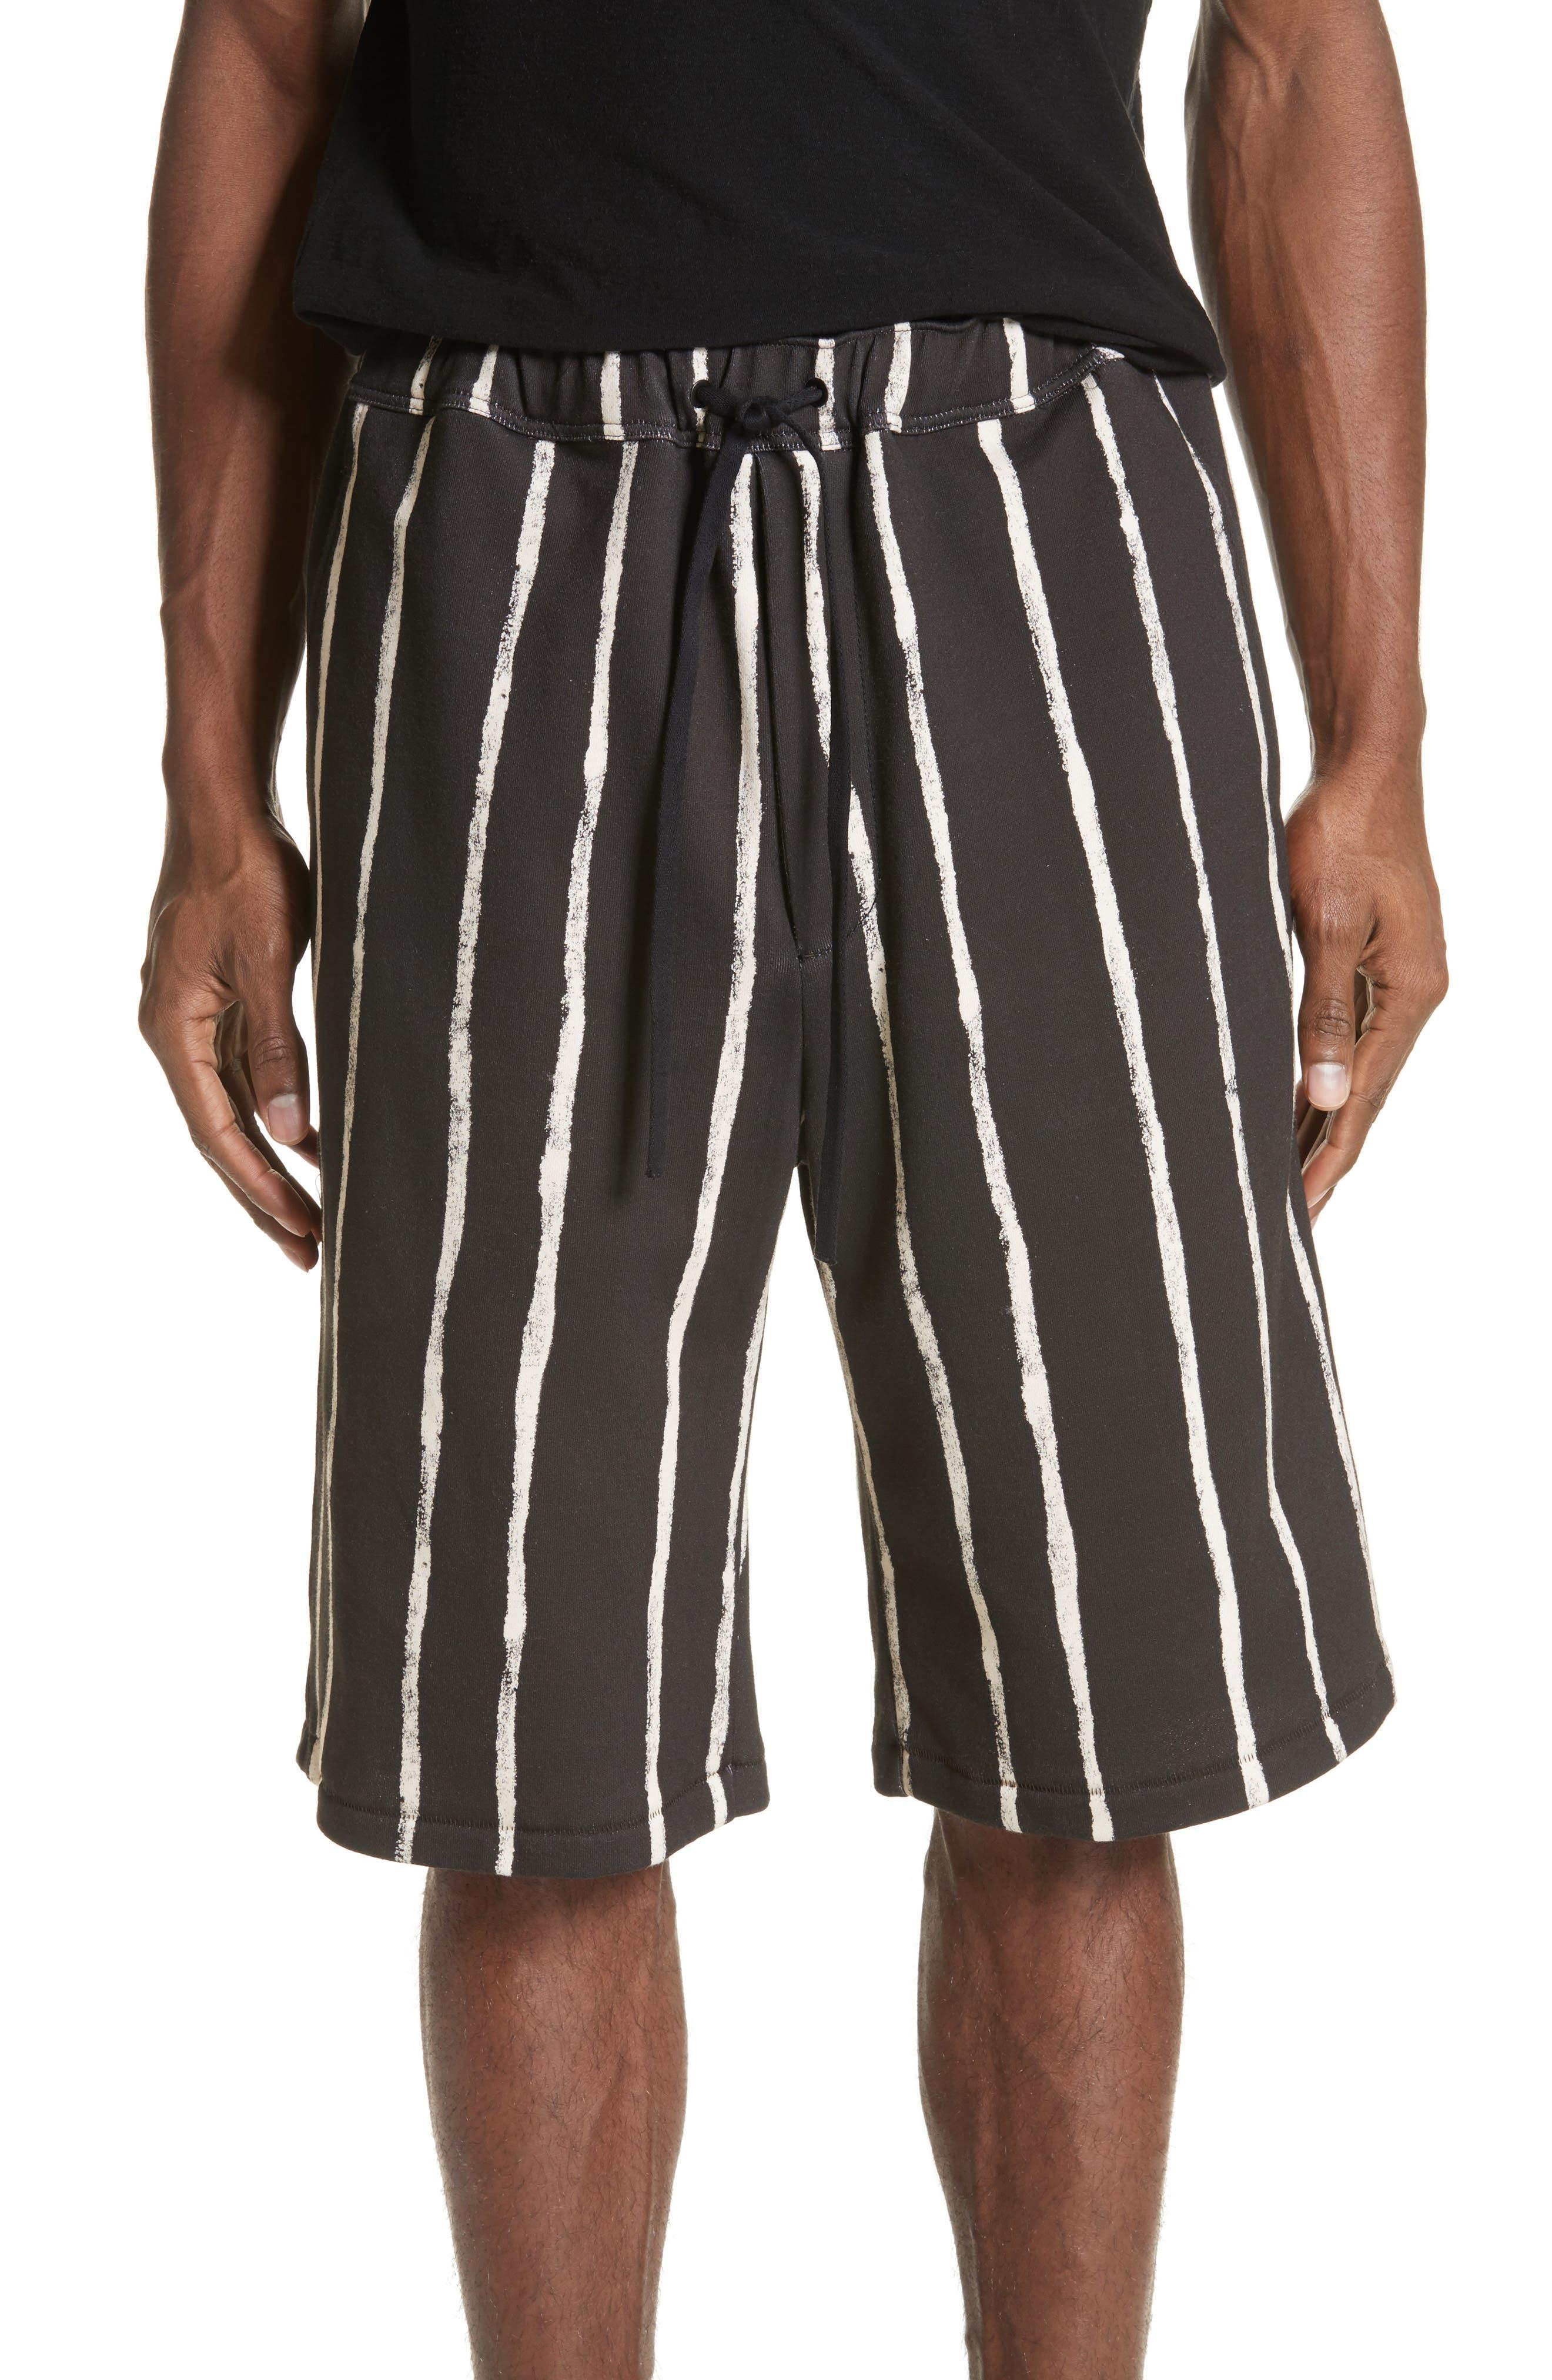 Striped Paint Shorts,                             Main thumbnail 1, color,                             001